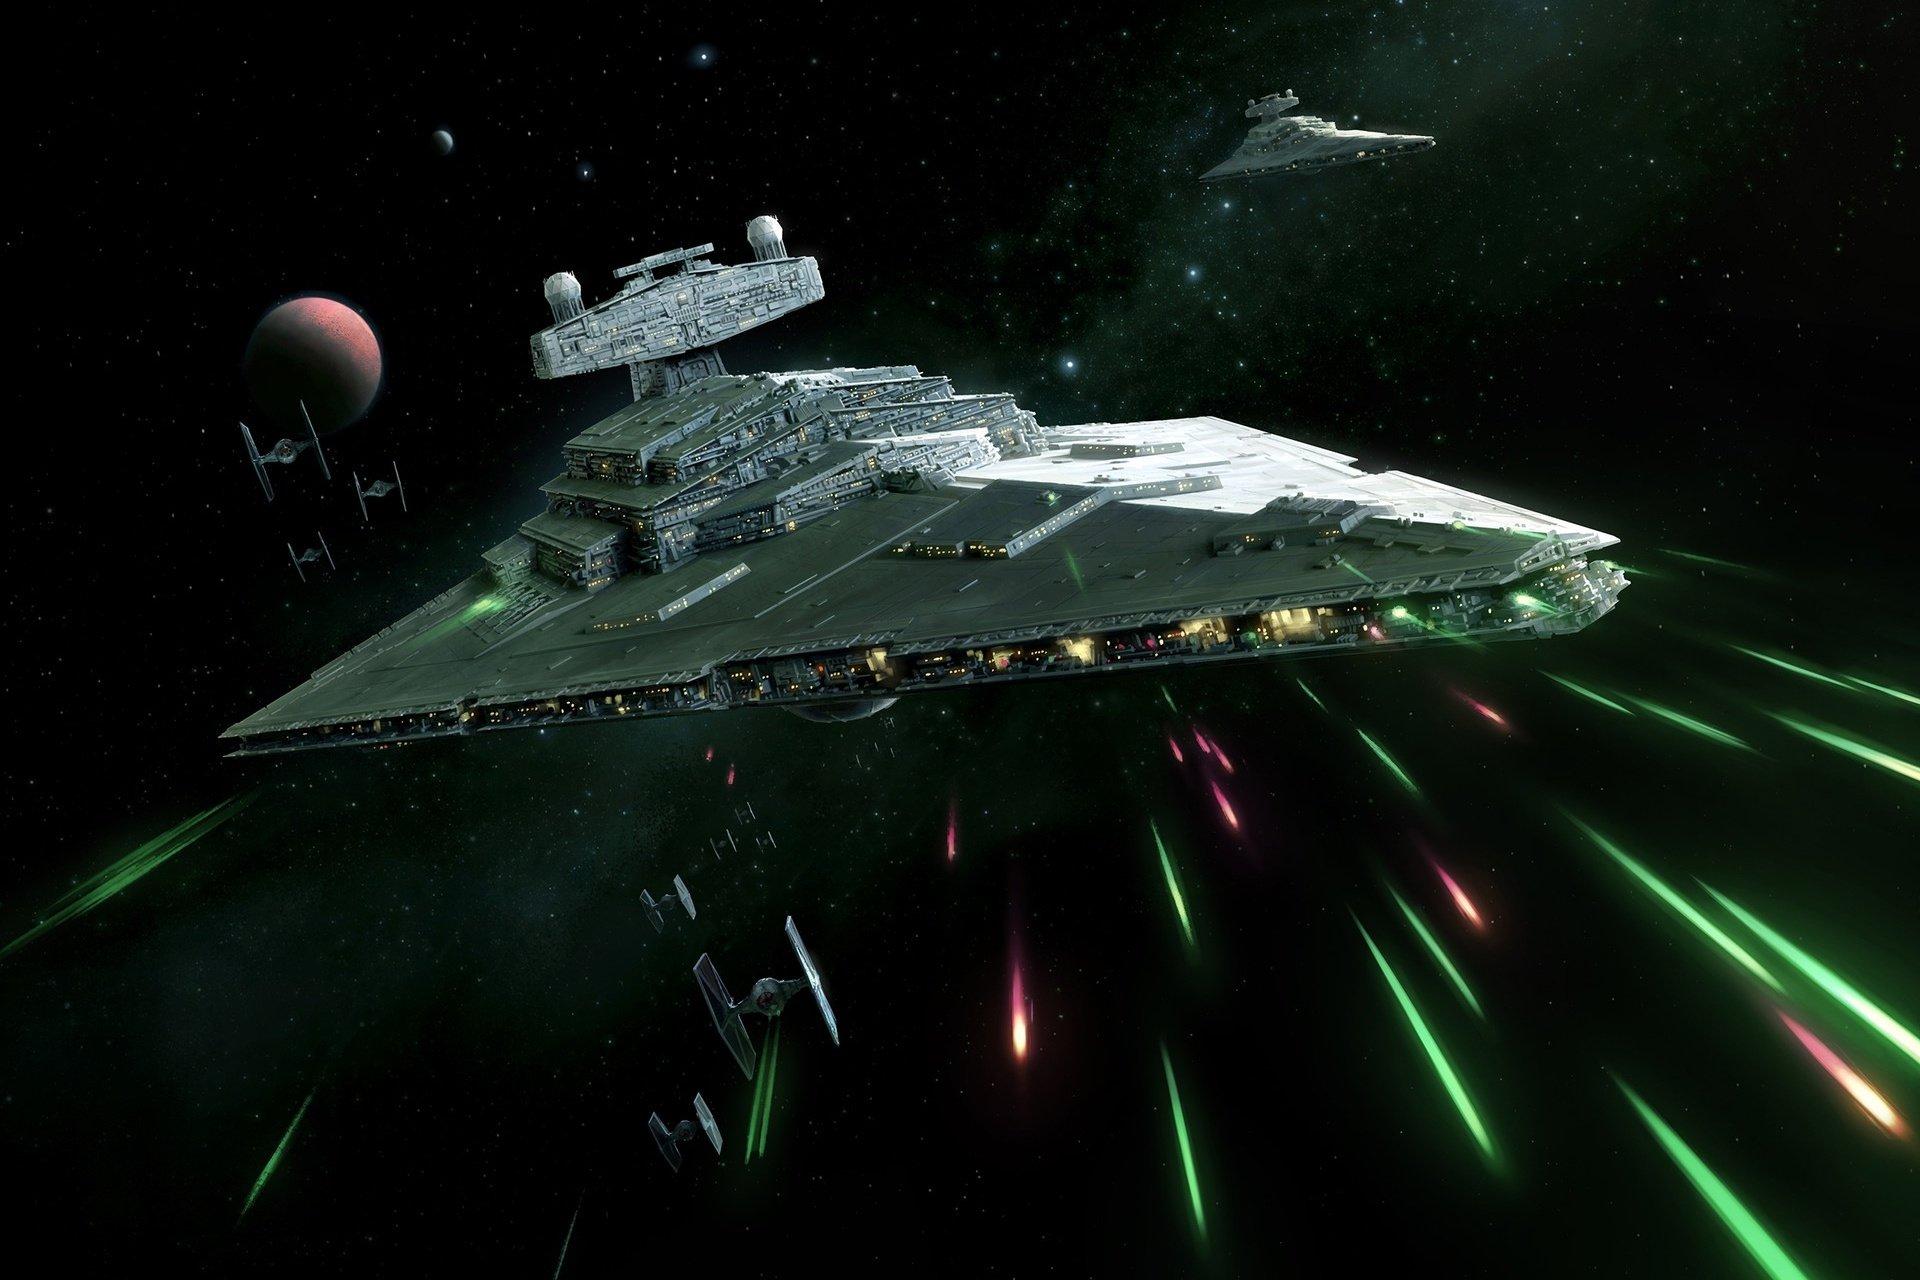 Star Wars Hd Wallpaper Background Image 1920x1280 Id 988772 Wallpaper Abyss